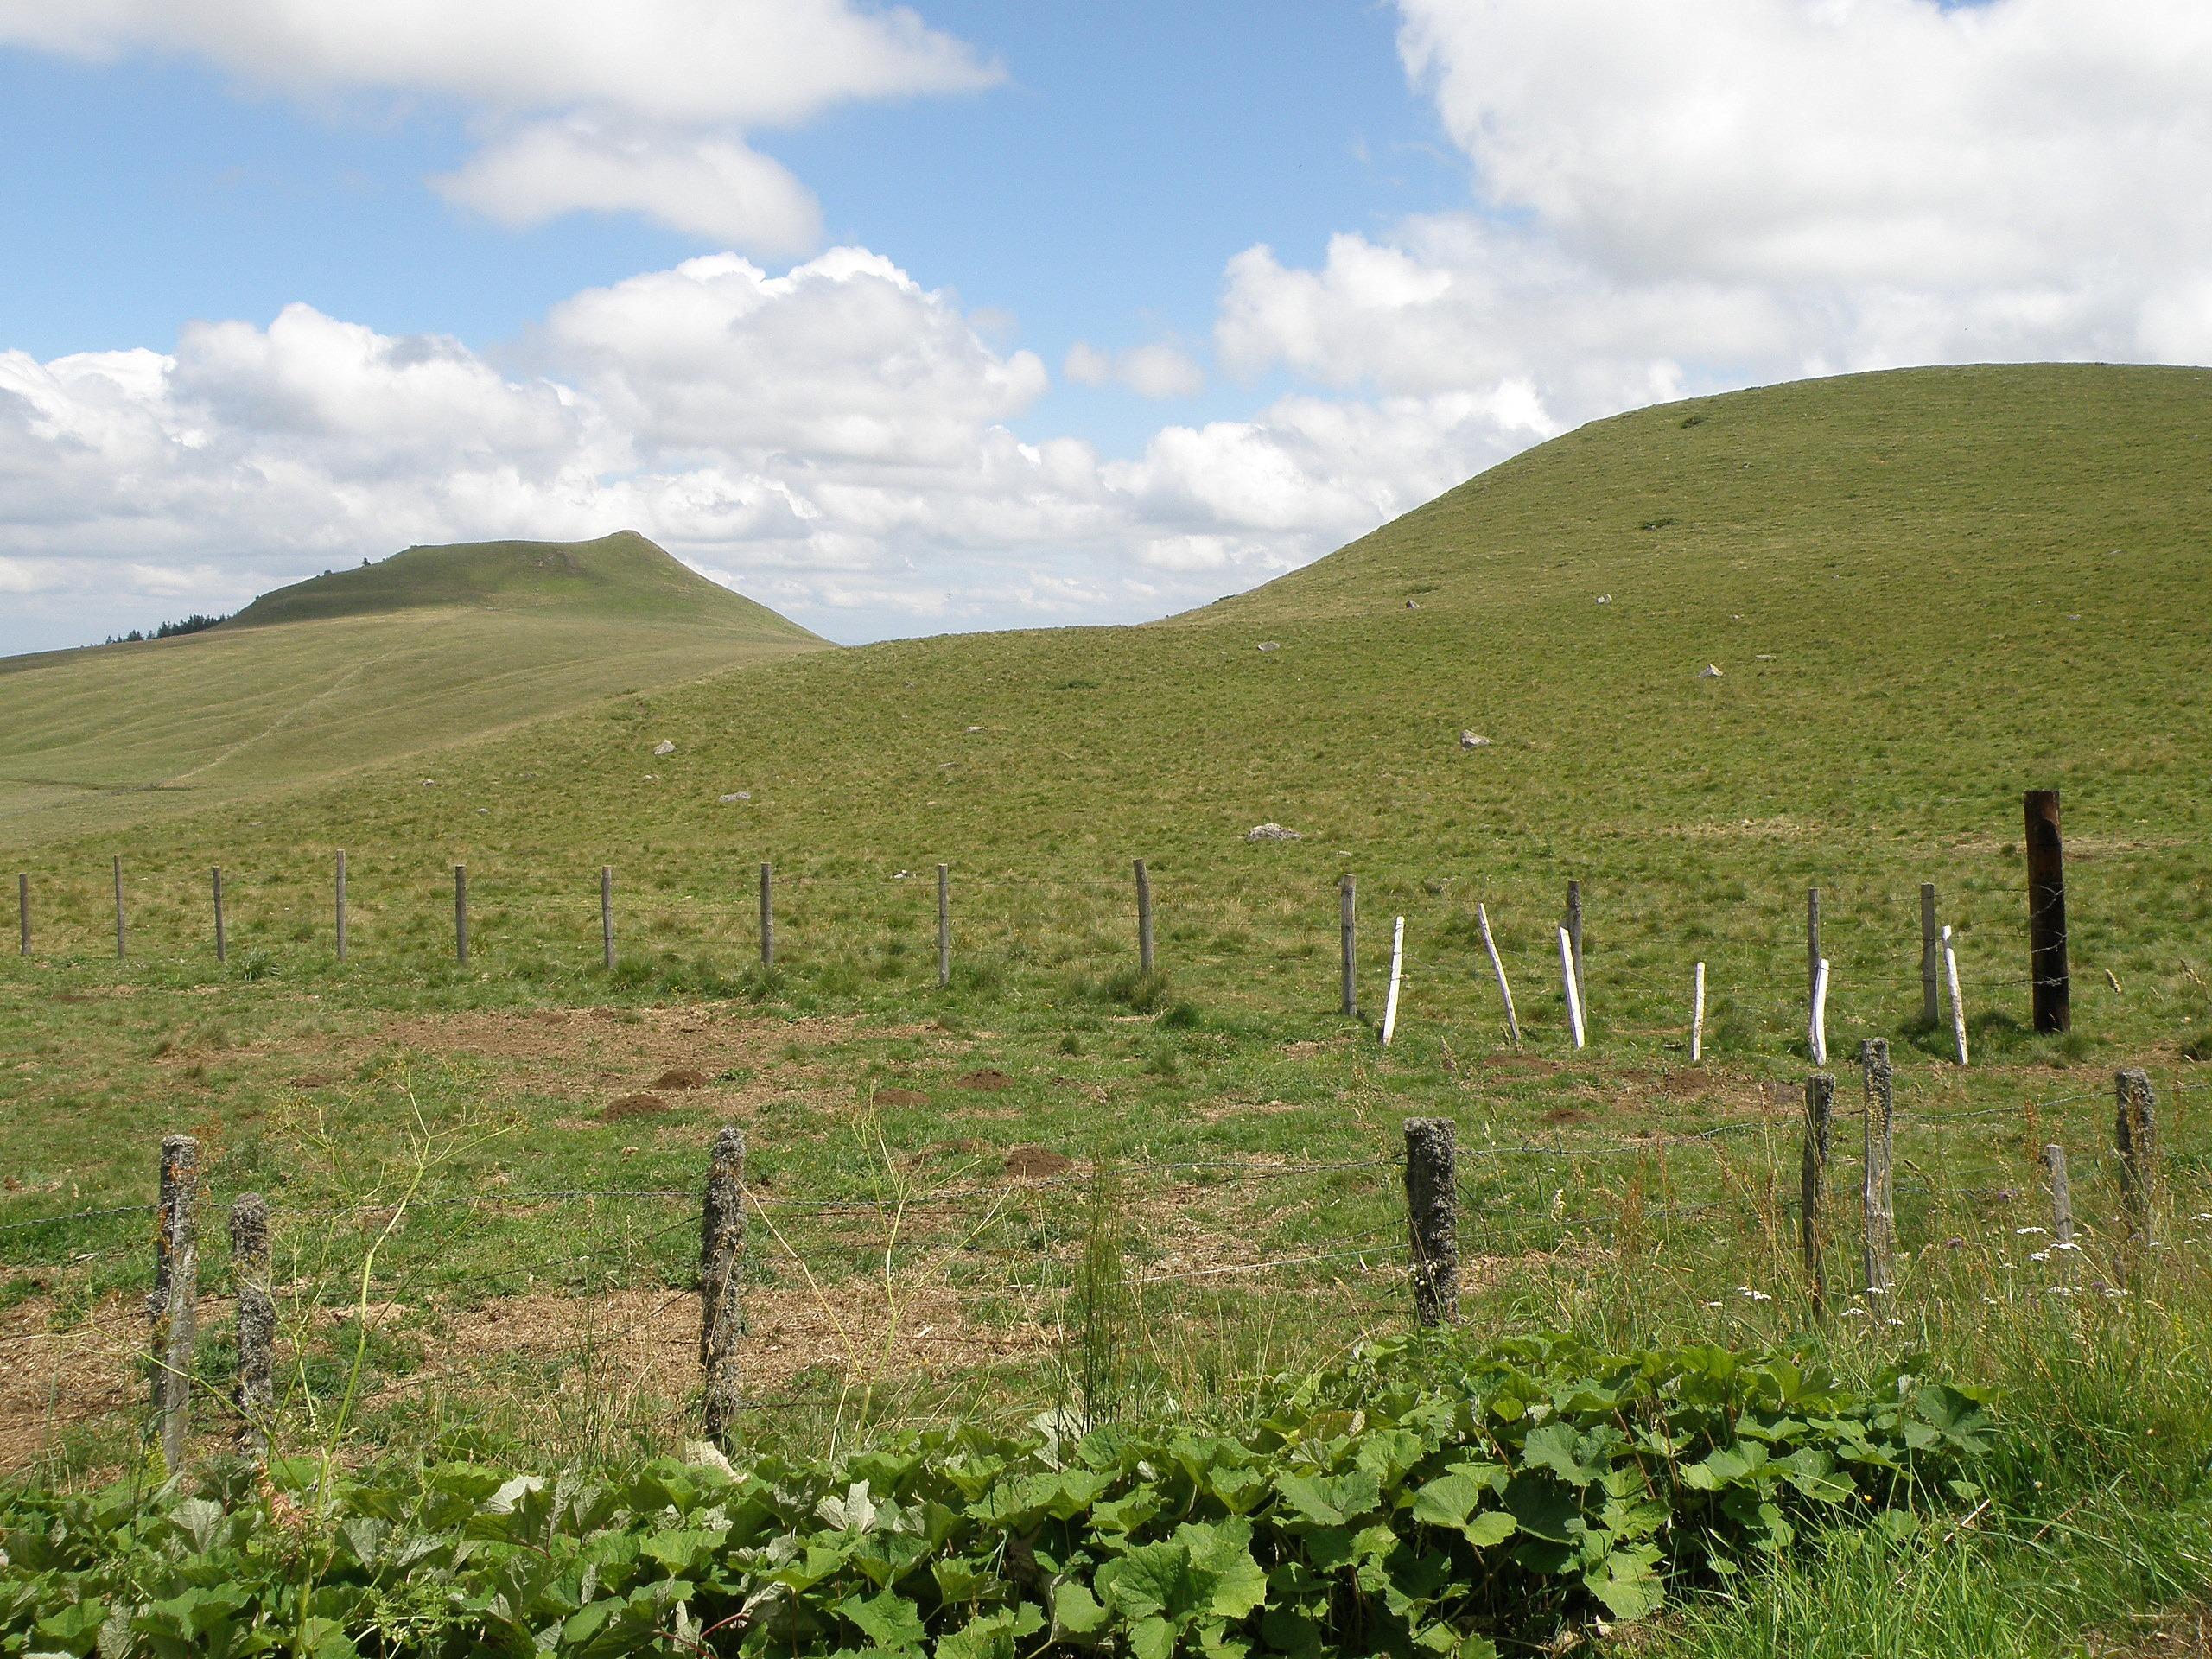 Kostenlose foto Landschaft Natur Gras Berg Zaun Himmel